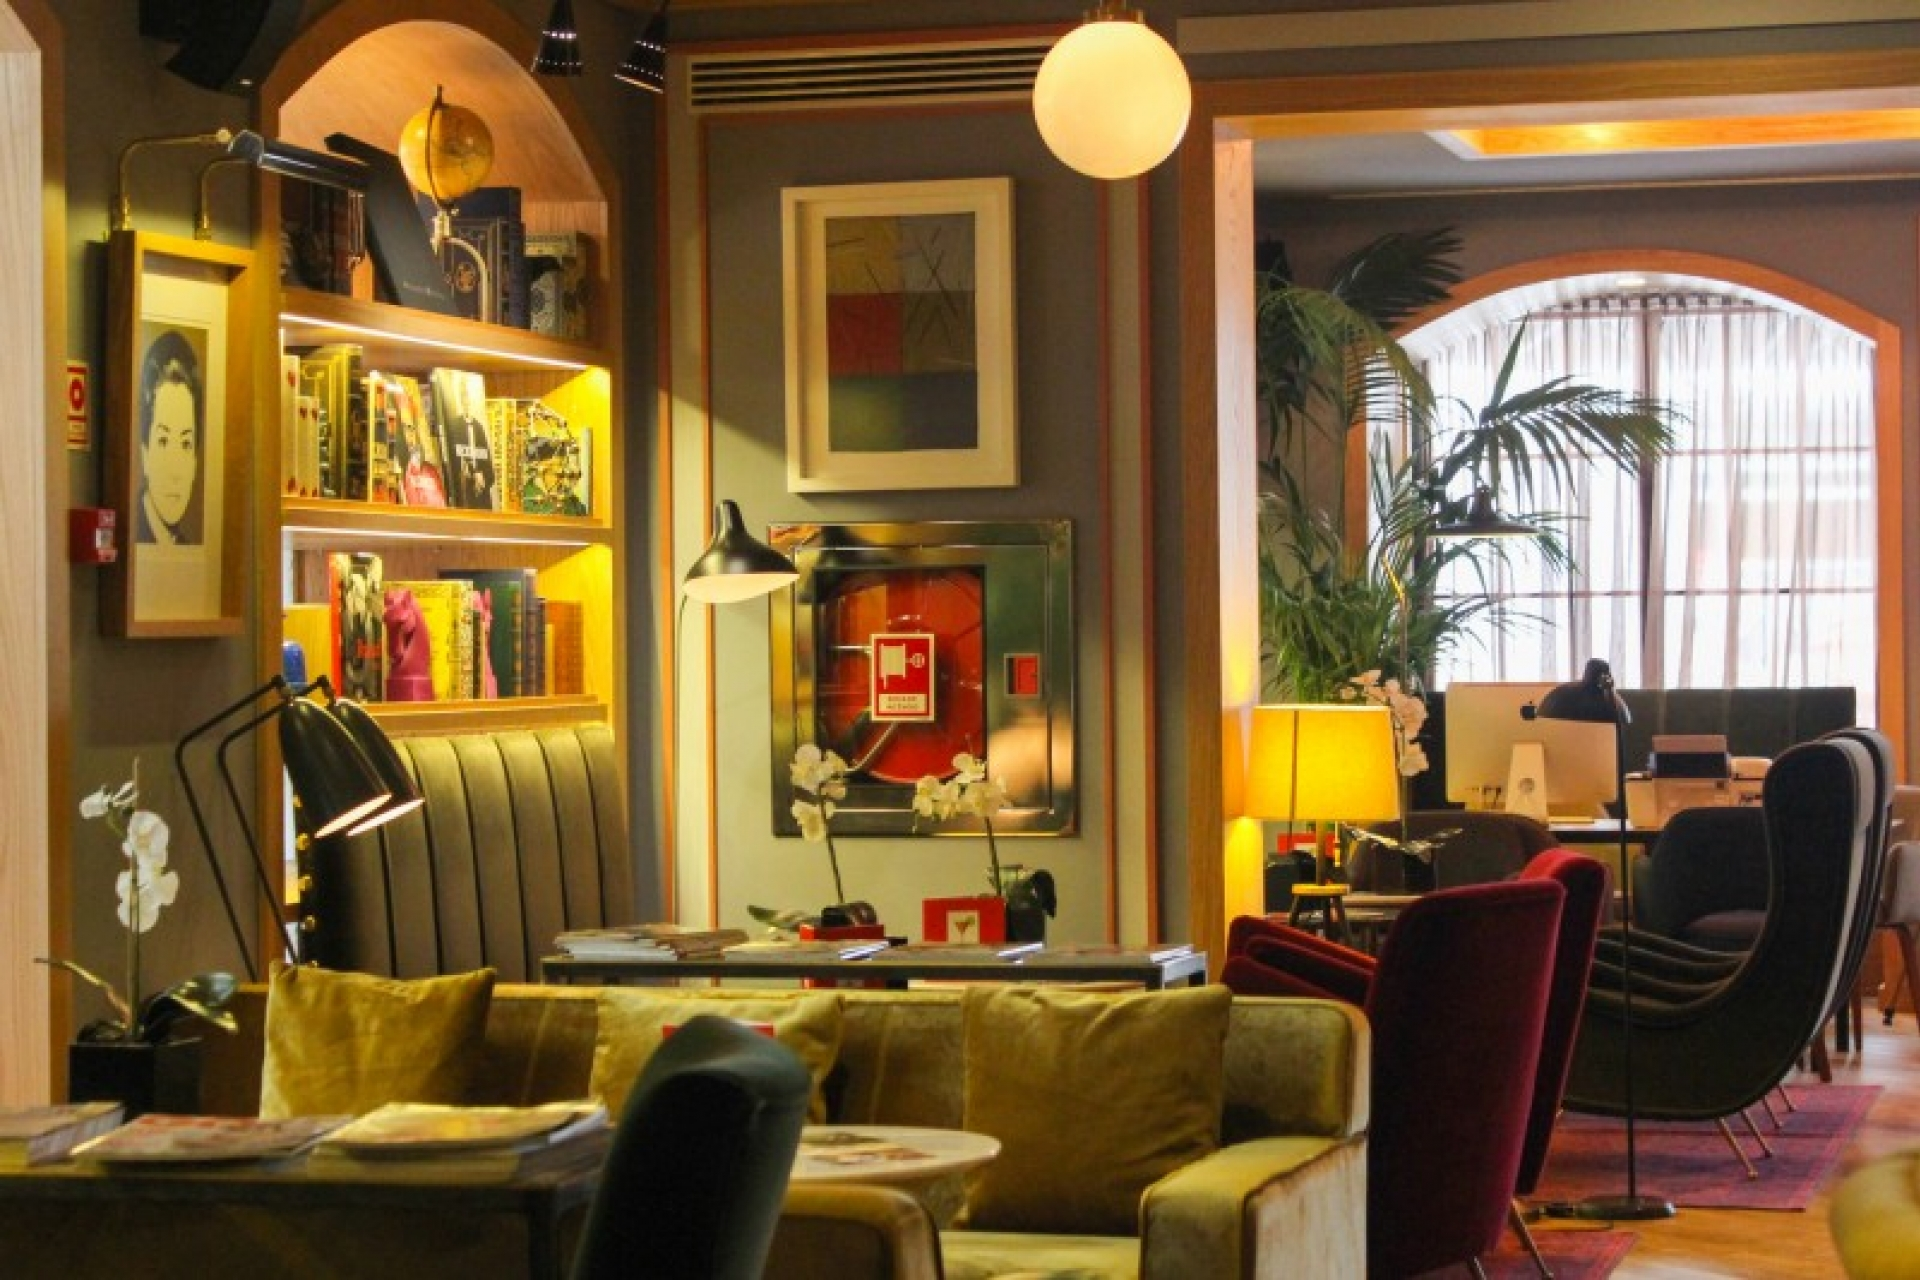 lisboa_cool_dormir_browns_central_hotel02.jpg